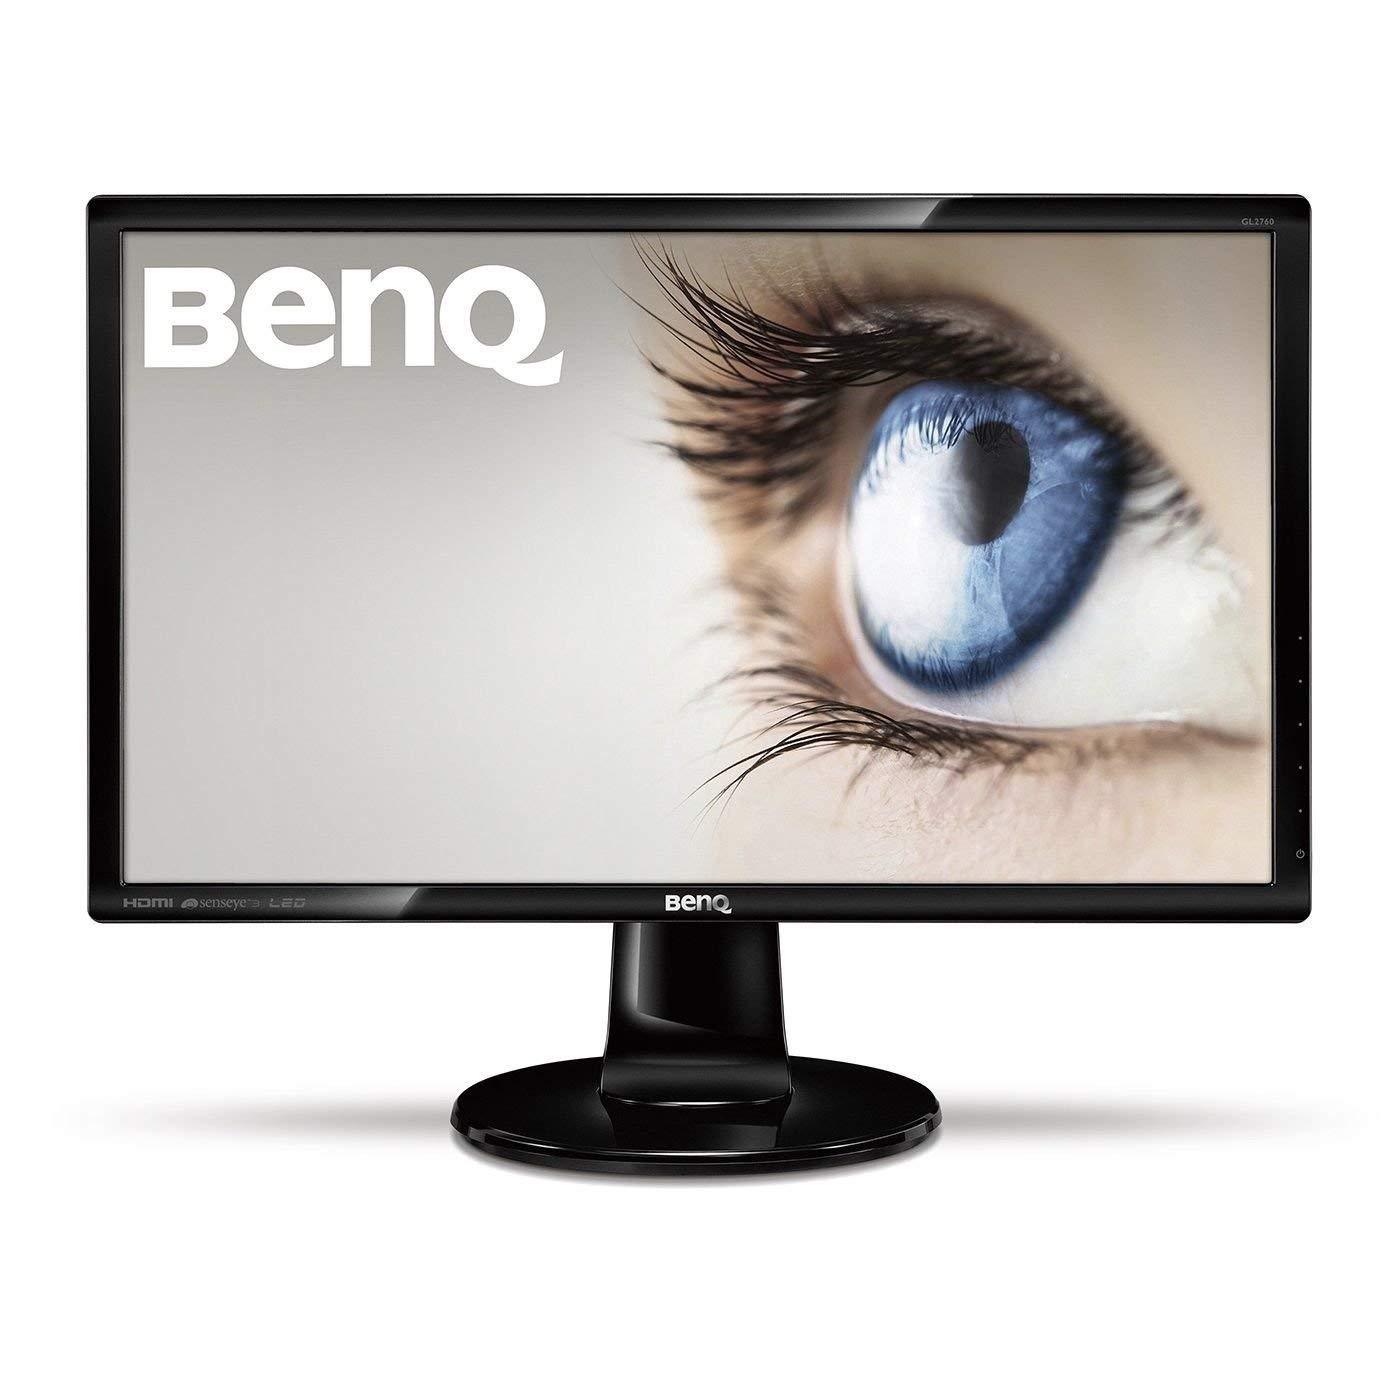 BenQ Monitor amazon